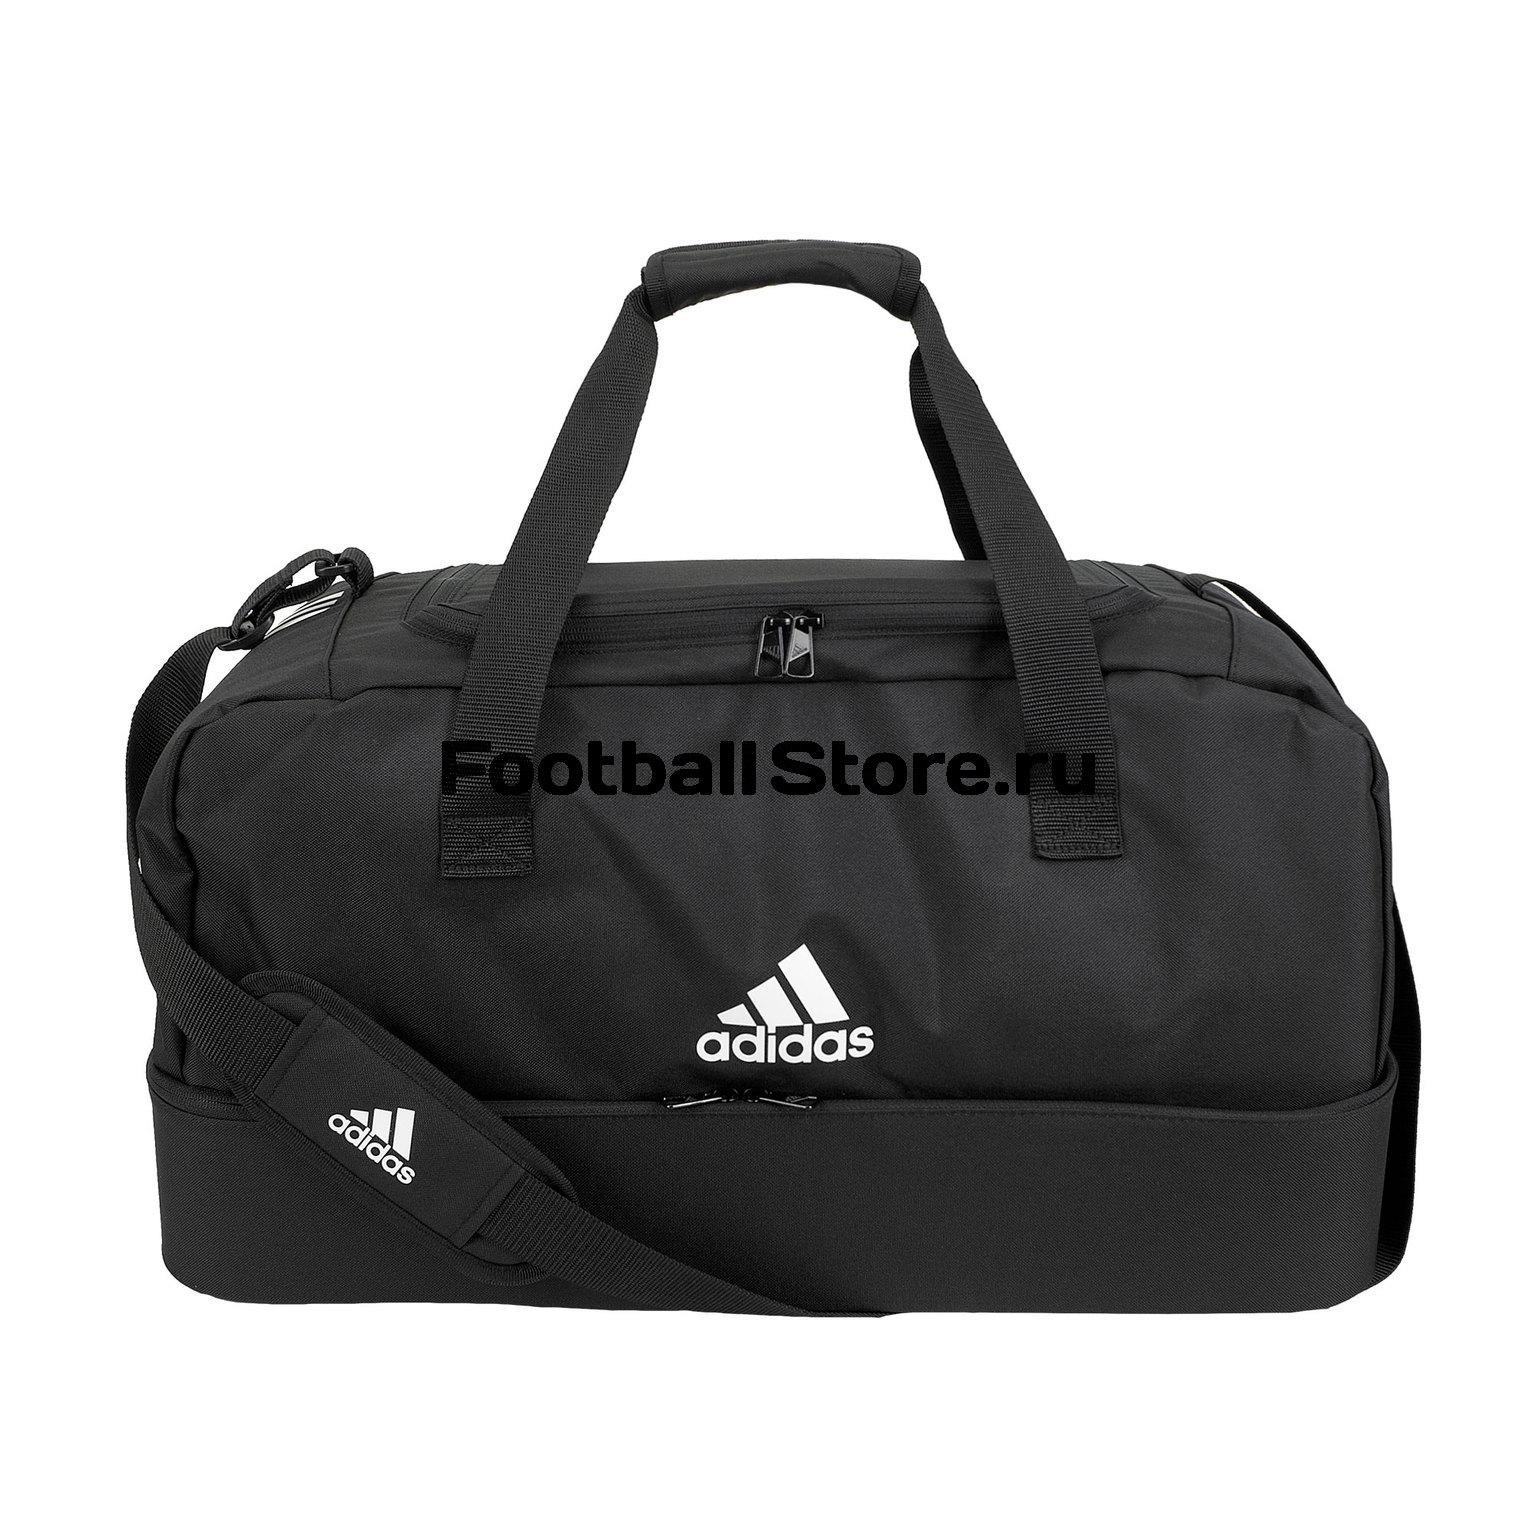 Сумка Adidas Tiro M DQ1080 сумка adidas tiro tb l bs4743